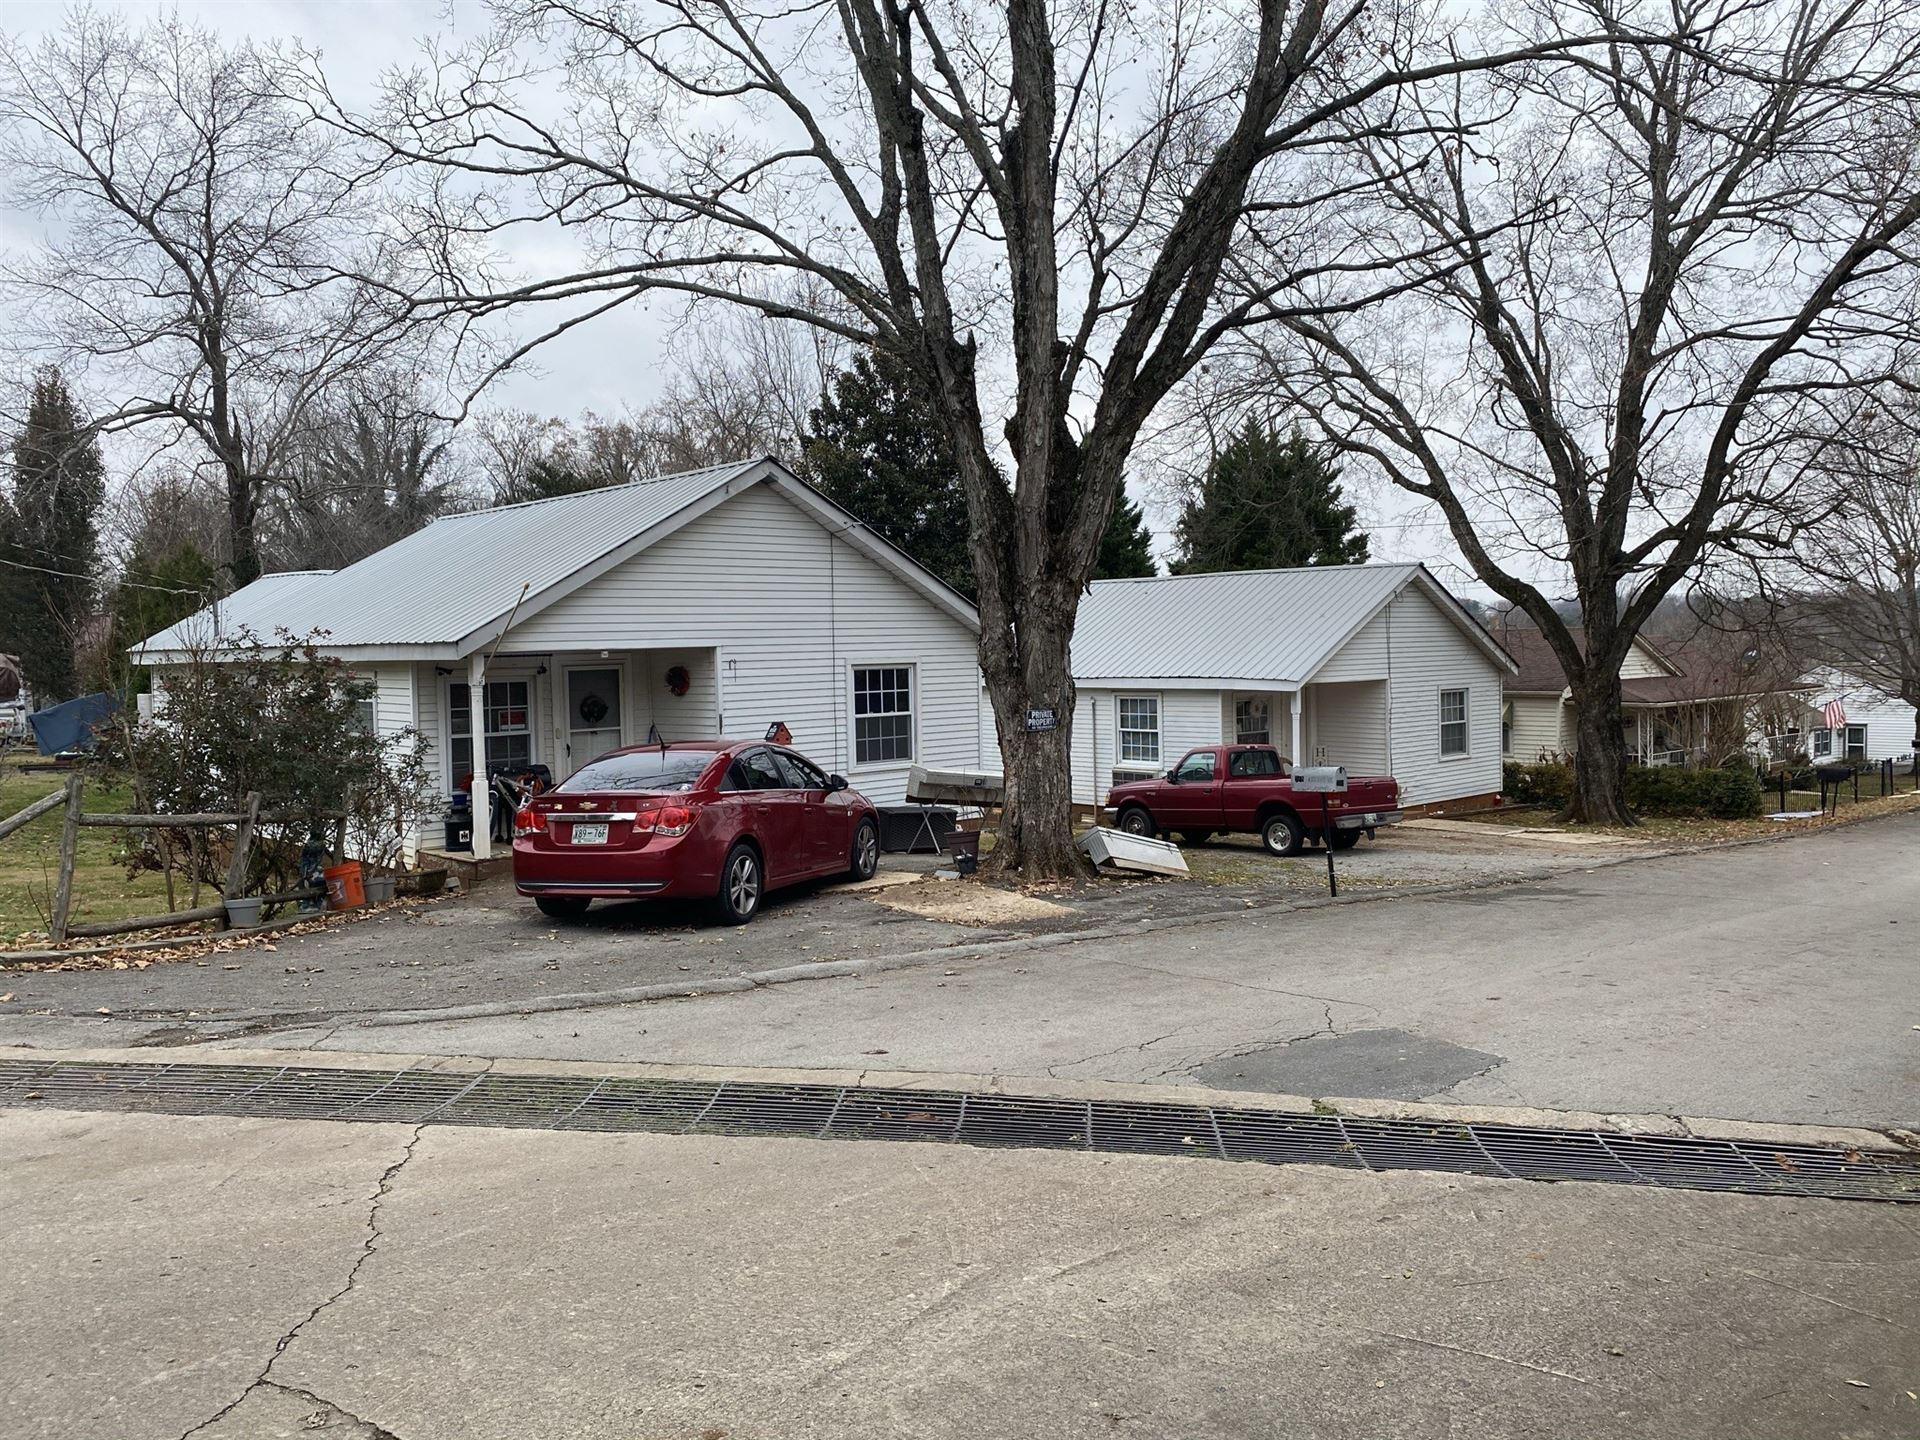 203 3rd Ave NE, Winchester, TN 37398 - MLS#: 2212261